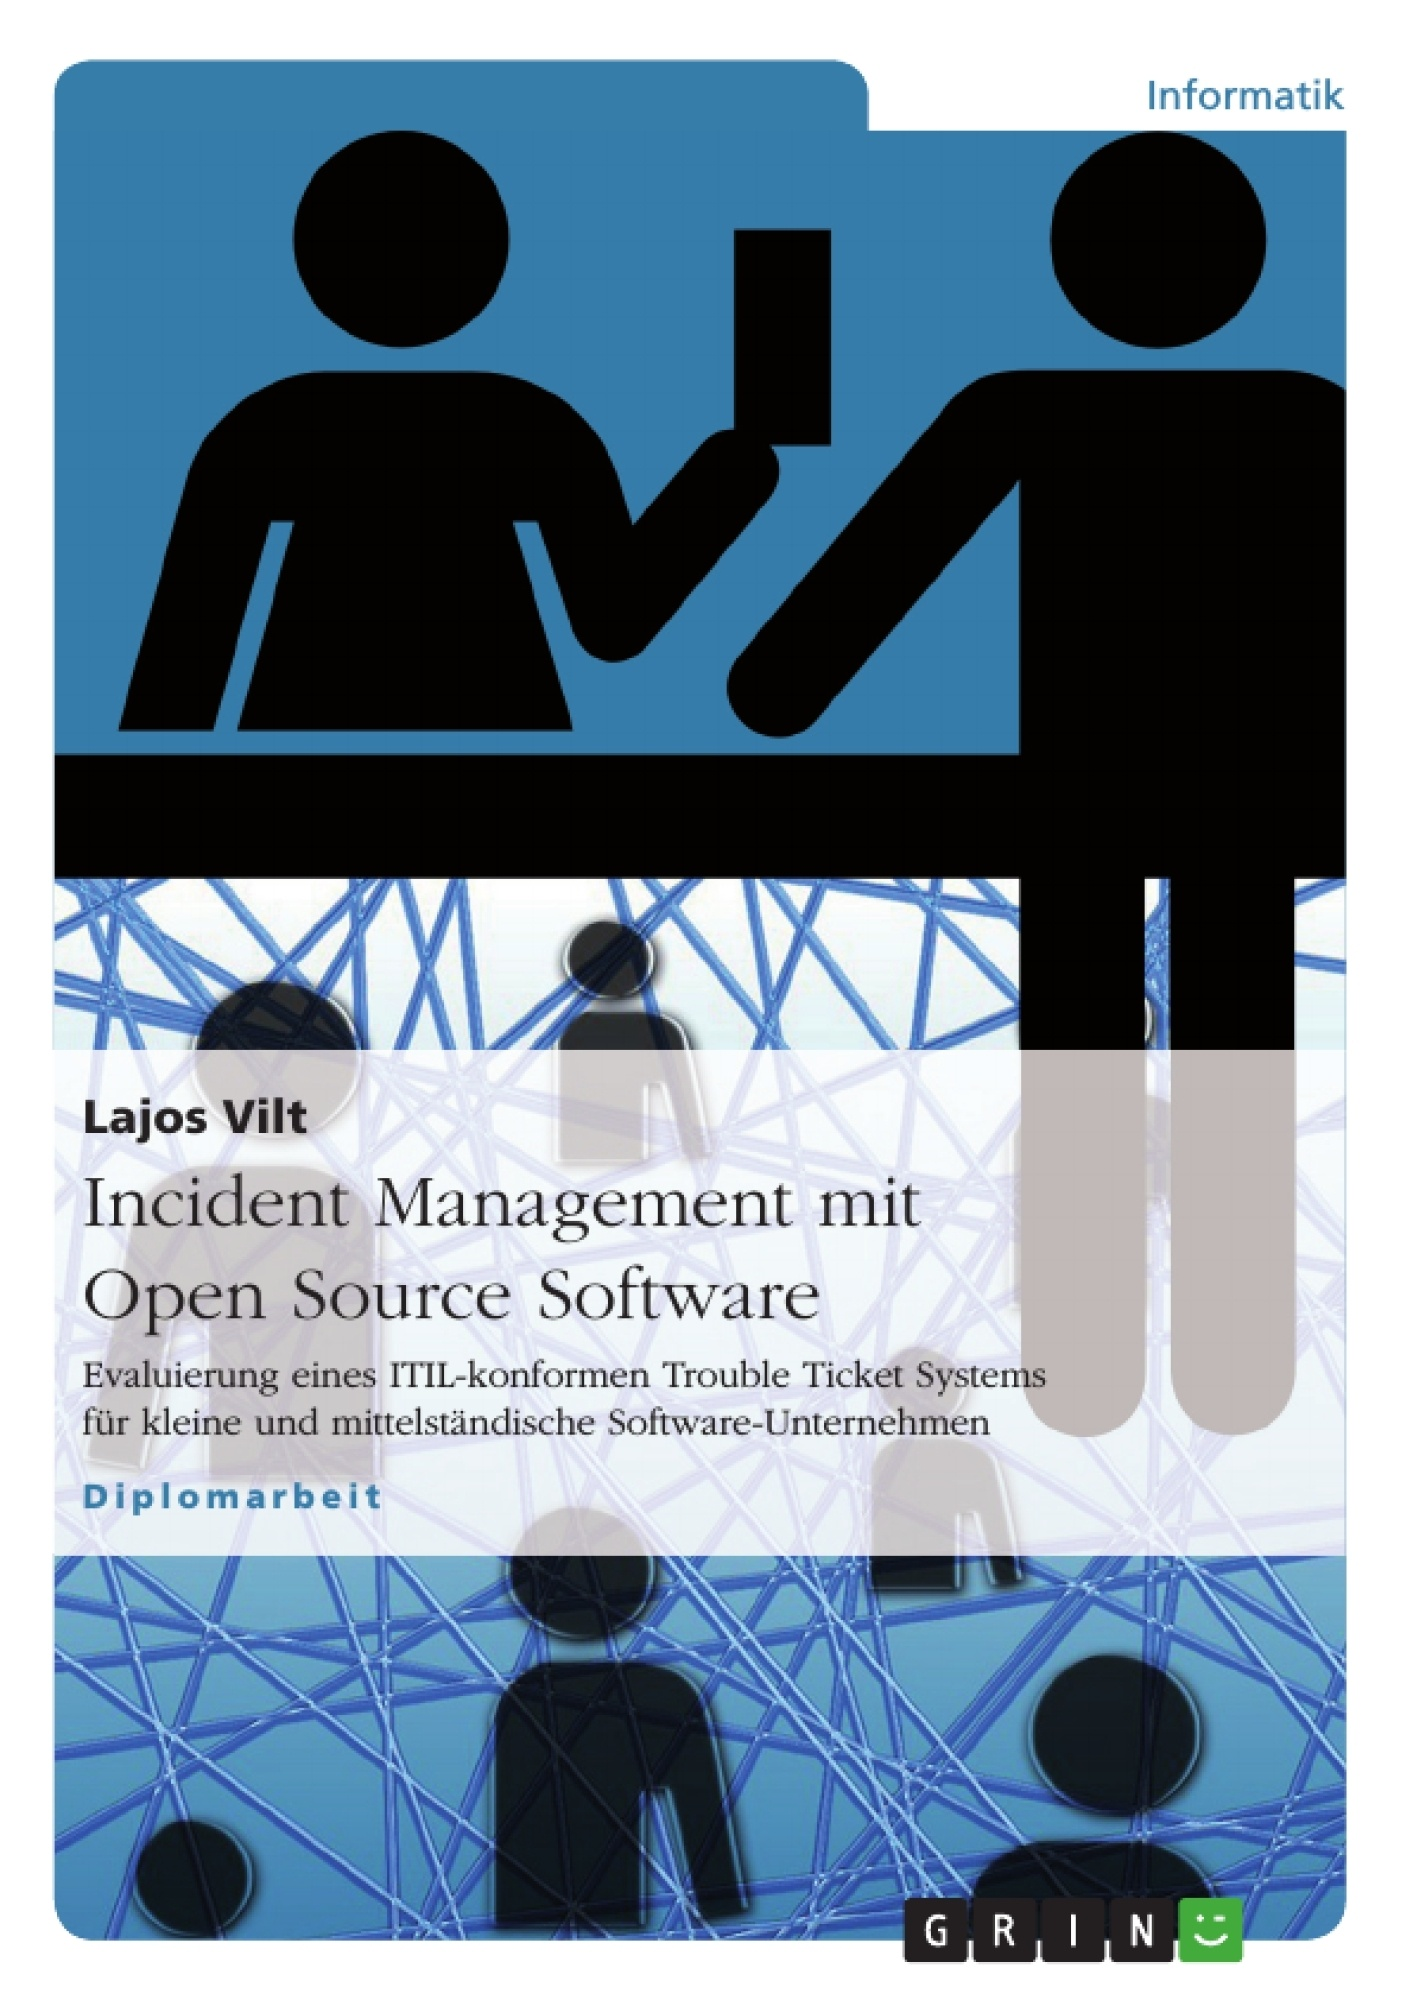 Titel: Incident Management mit Open Source Software